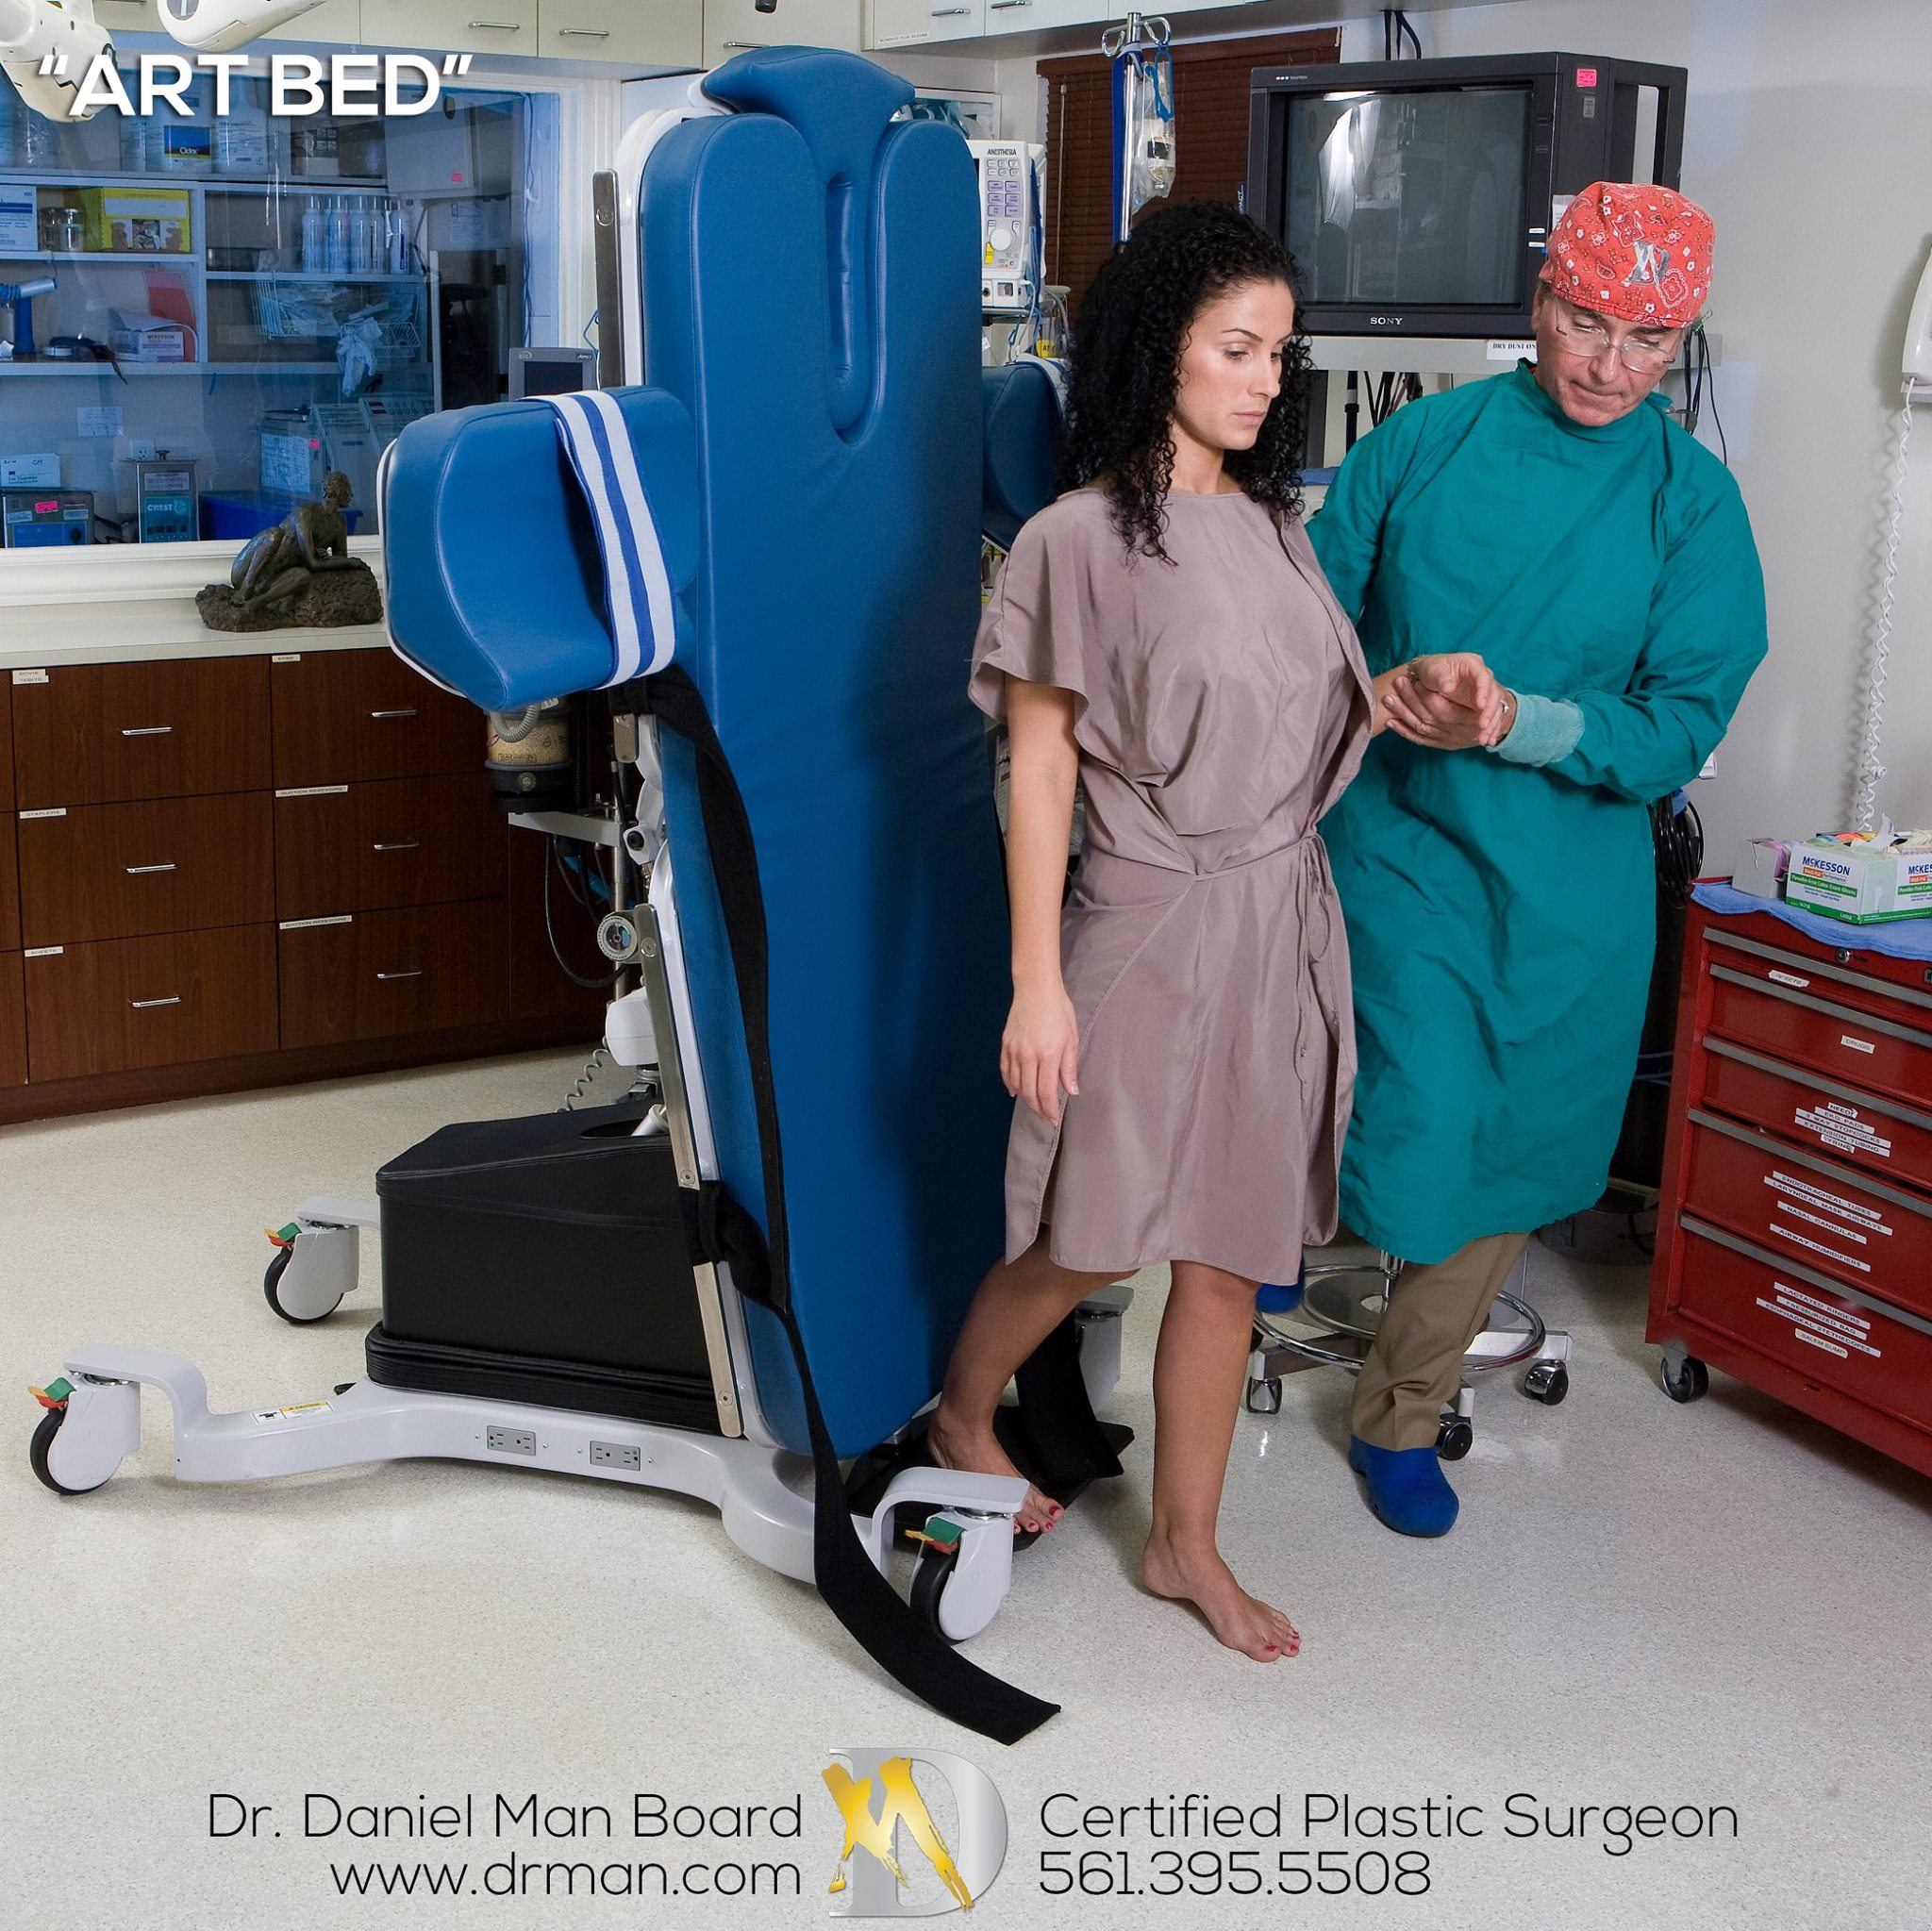 Plastic Surgery in Boca Raton, FL